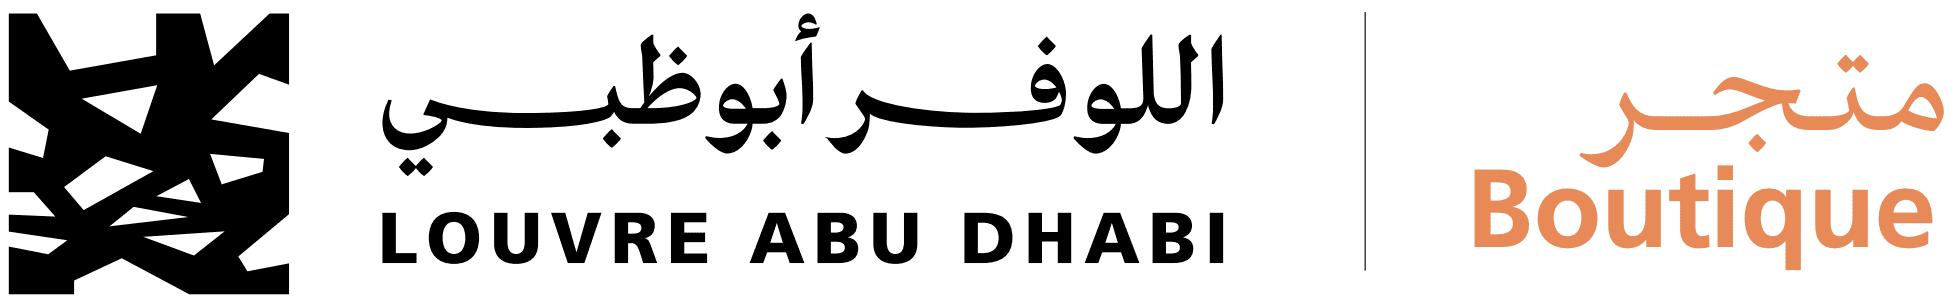 Louvre Abu Dhabi Boutique